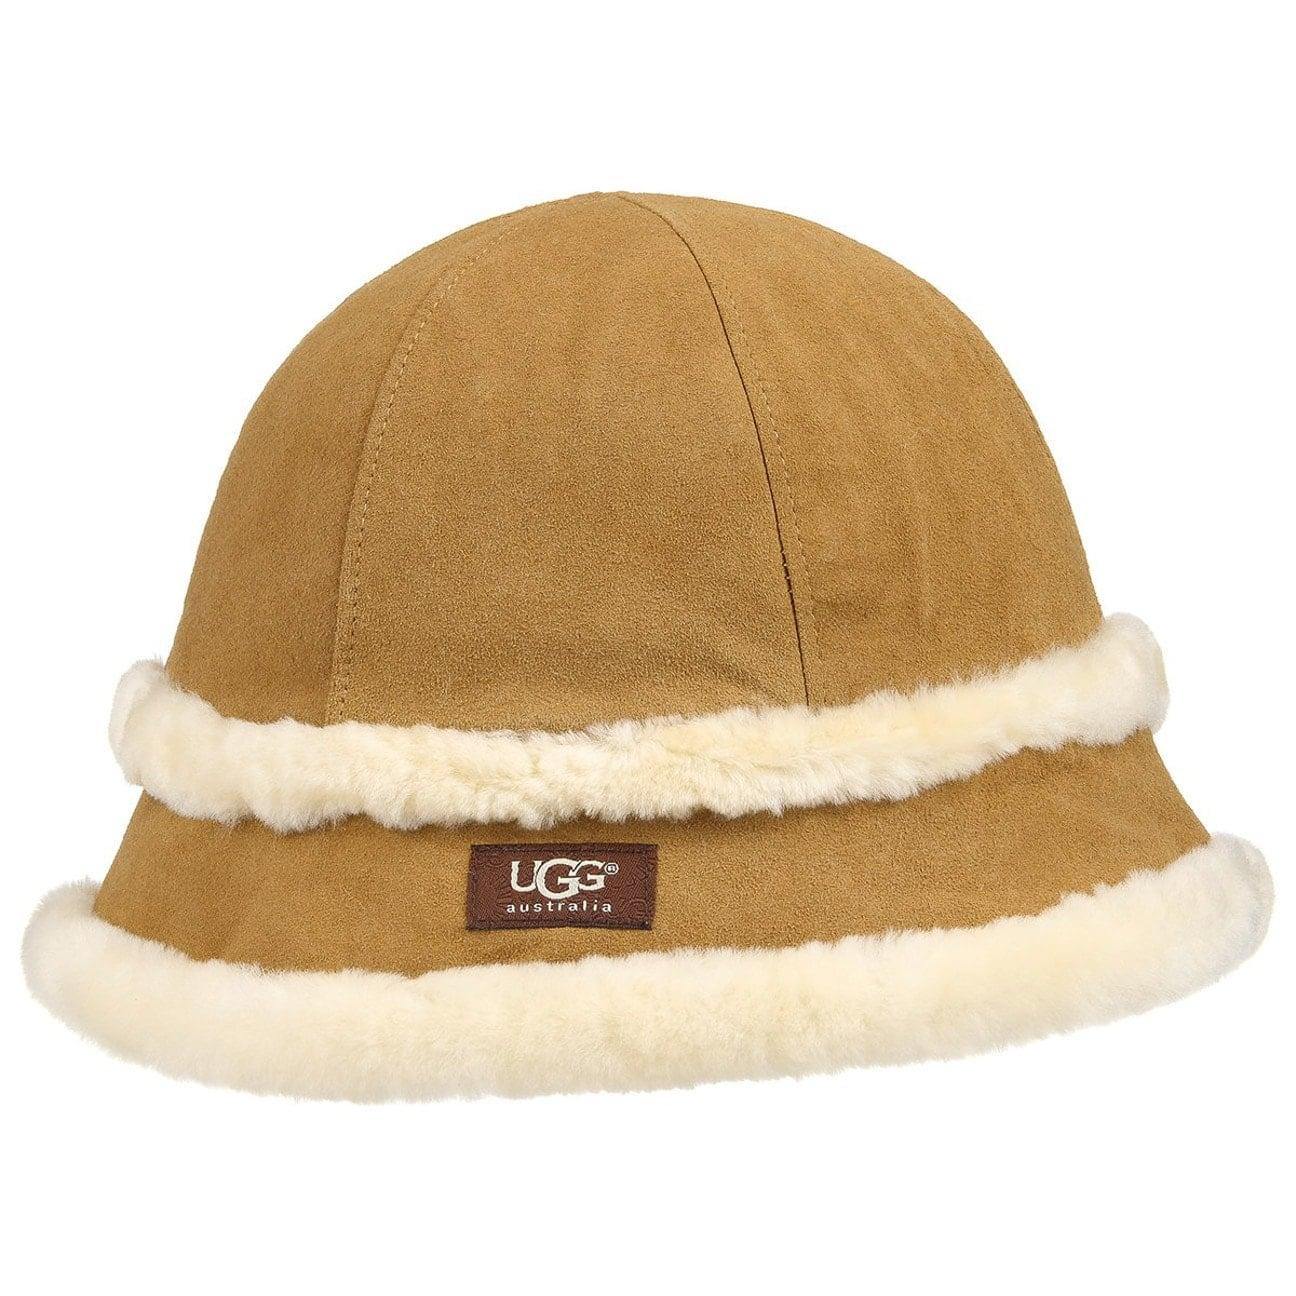 8391a4b2adc ... black 1 · Bieja Sheepskin Women´s Bucket Hat by UGG - camel 1